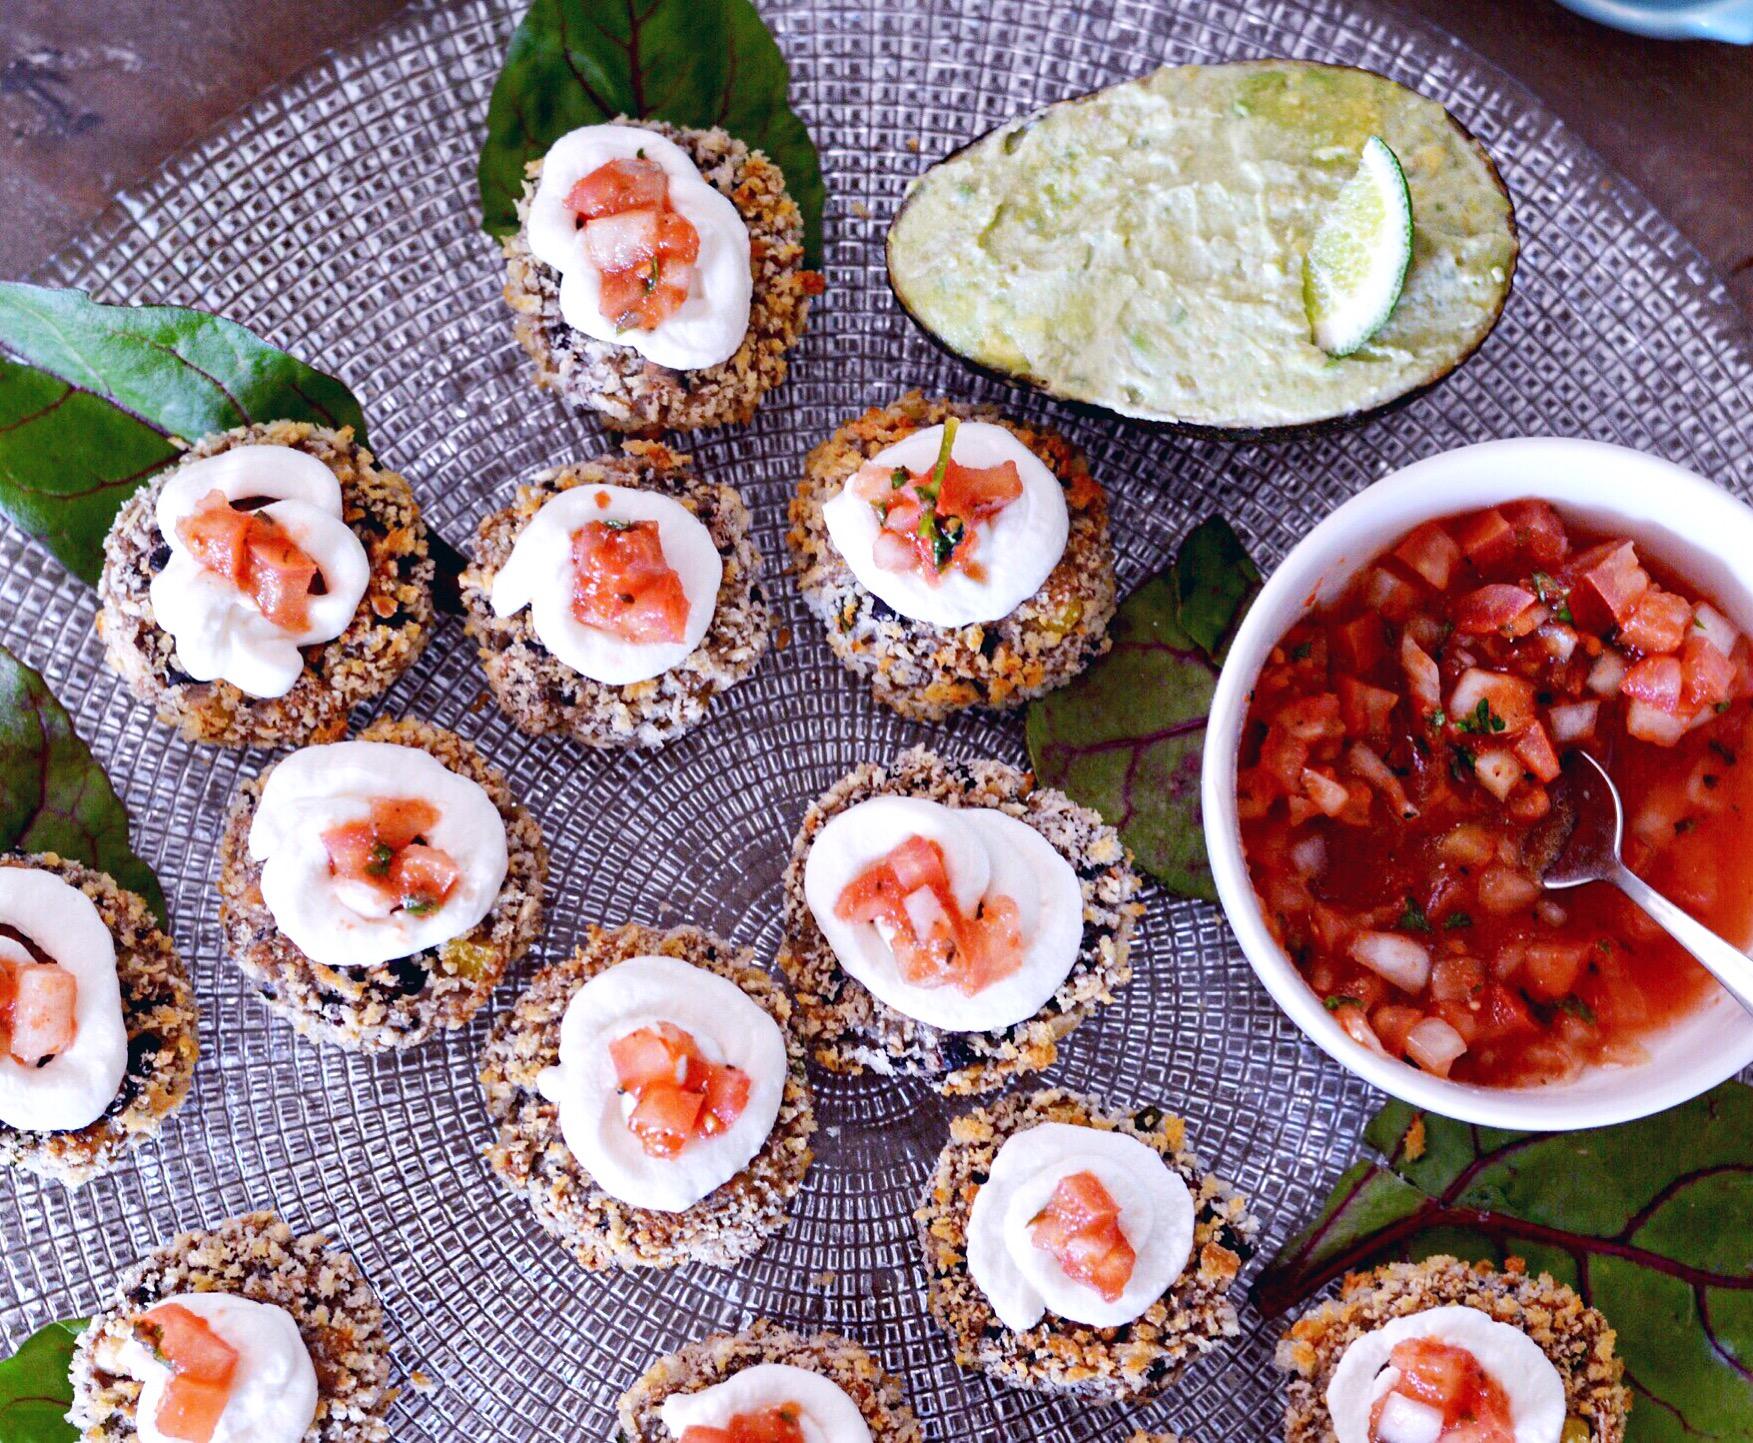 3 healthy dip alternatives - salsa